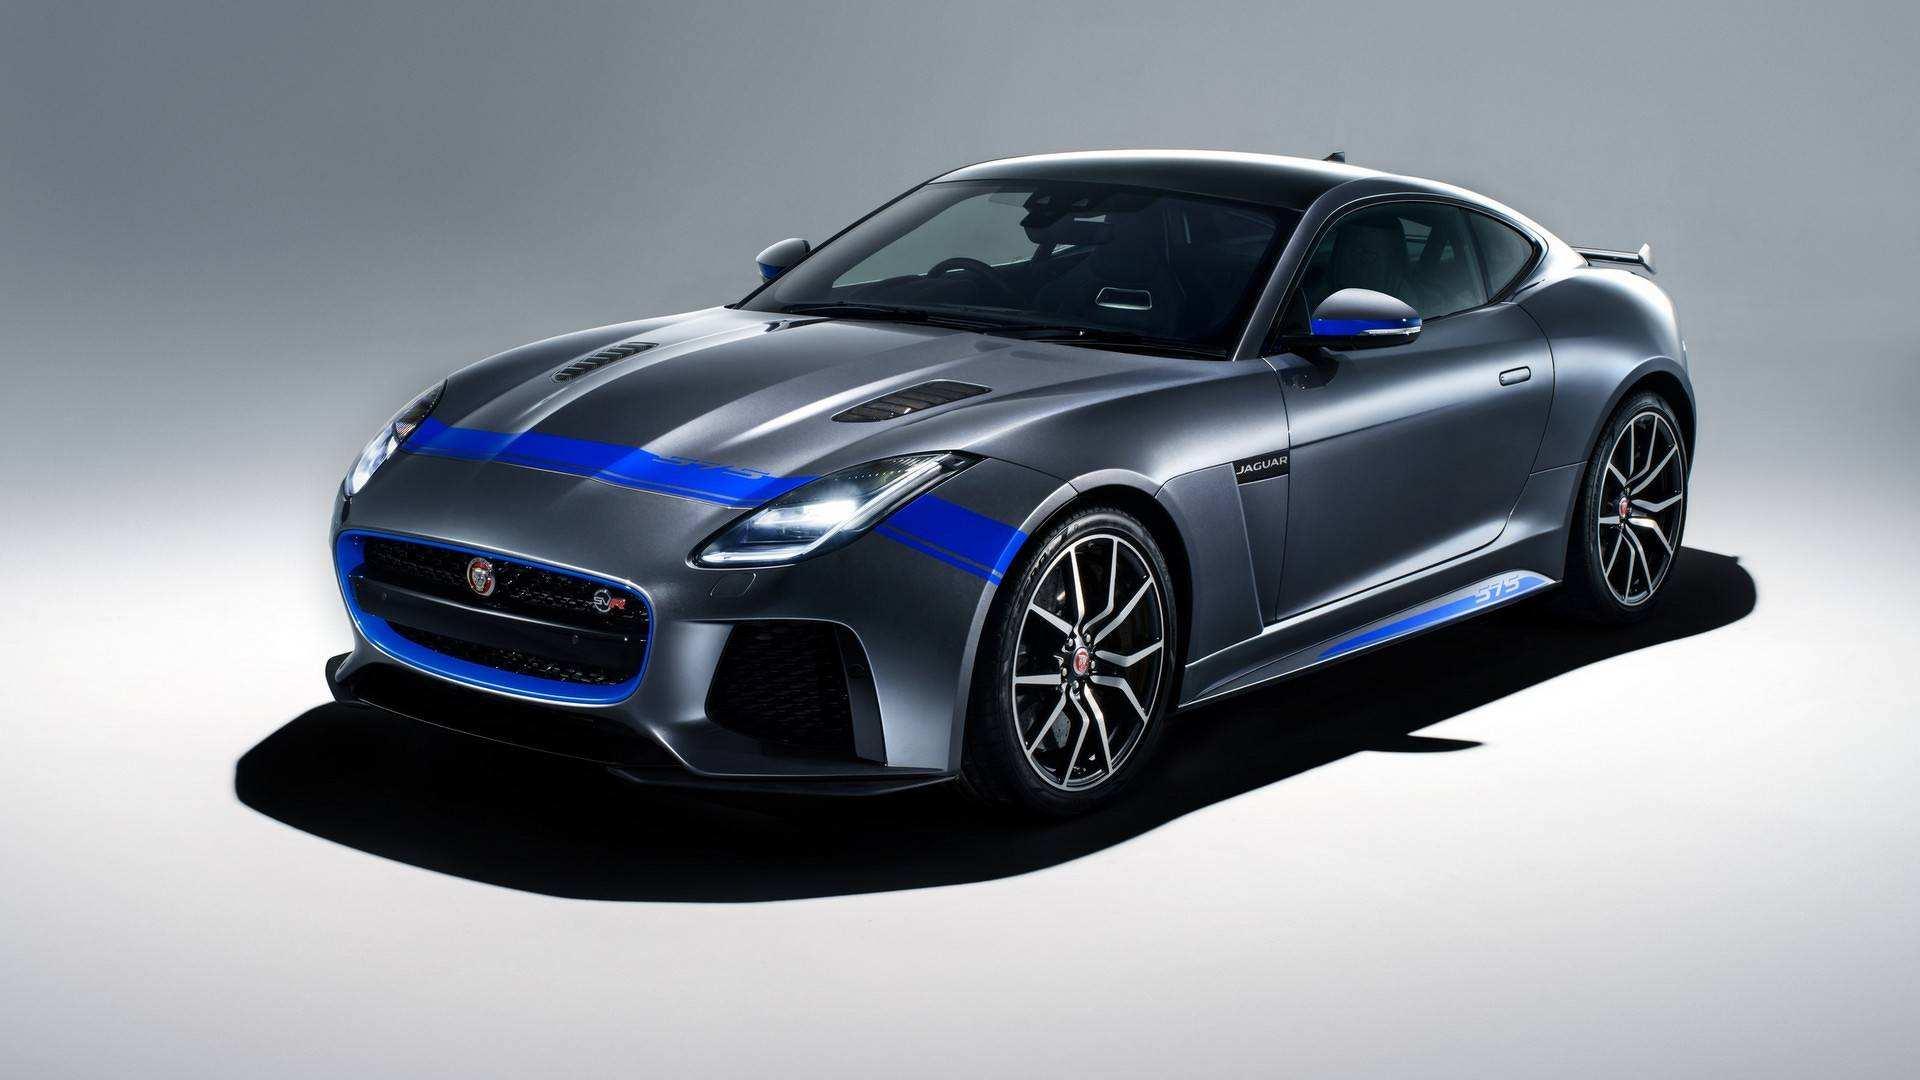 28 Great 2020 Jaguar F Type Horsepower Style by 2020 Jaguar F Type Horsepower